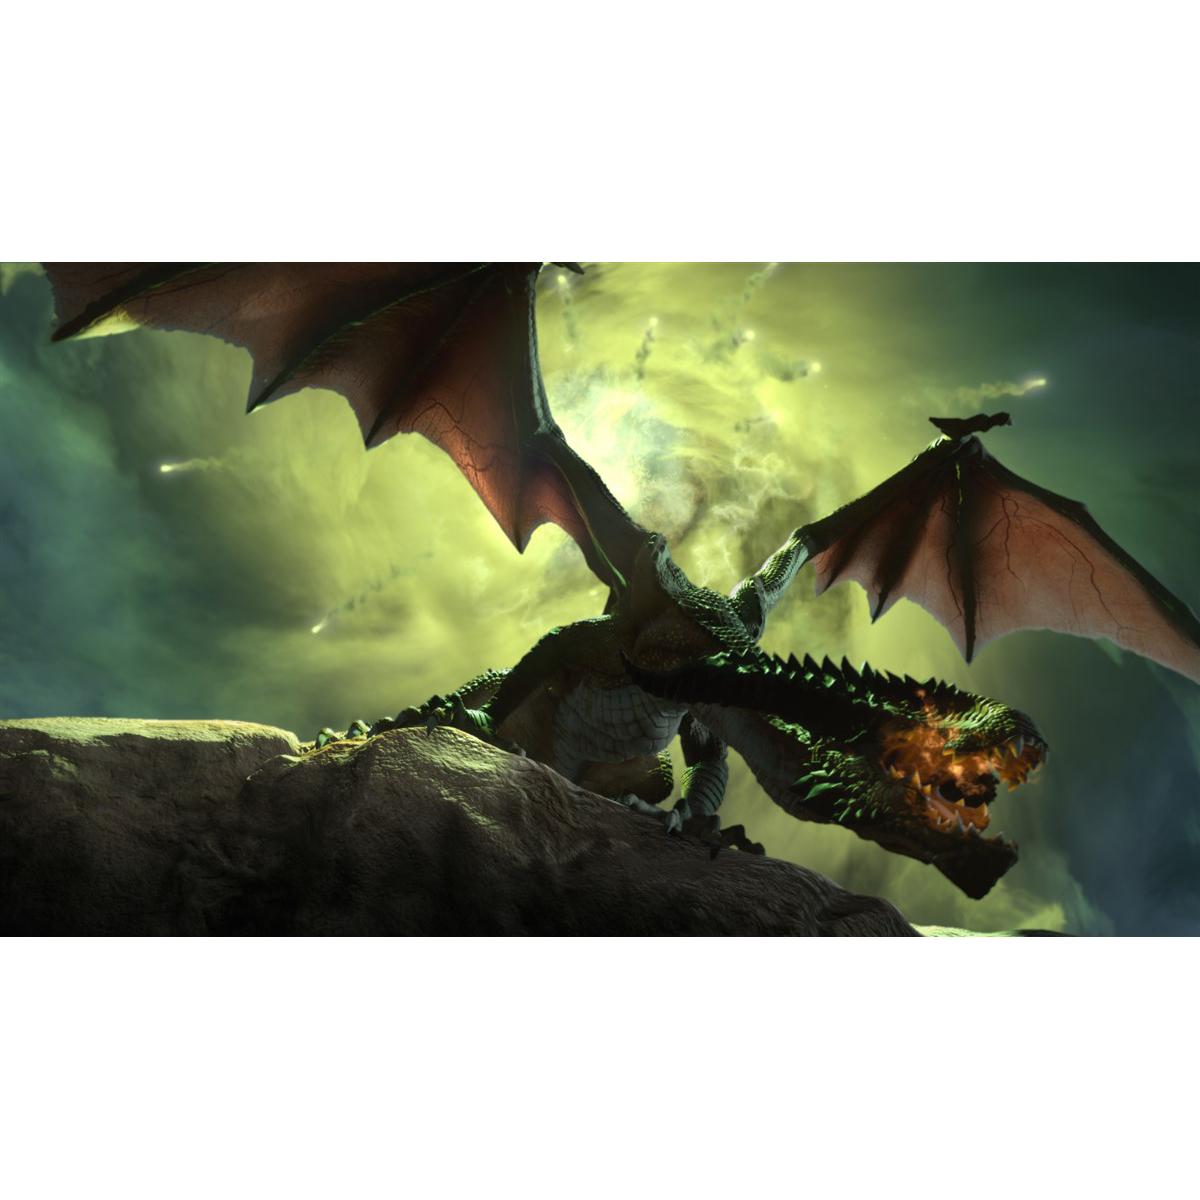 Joc Dragon Age: Inquisition pentru PlayStation 3 3